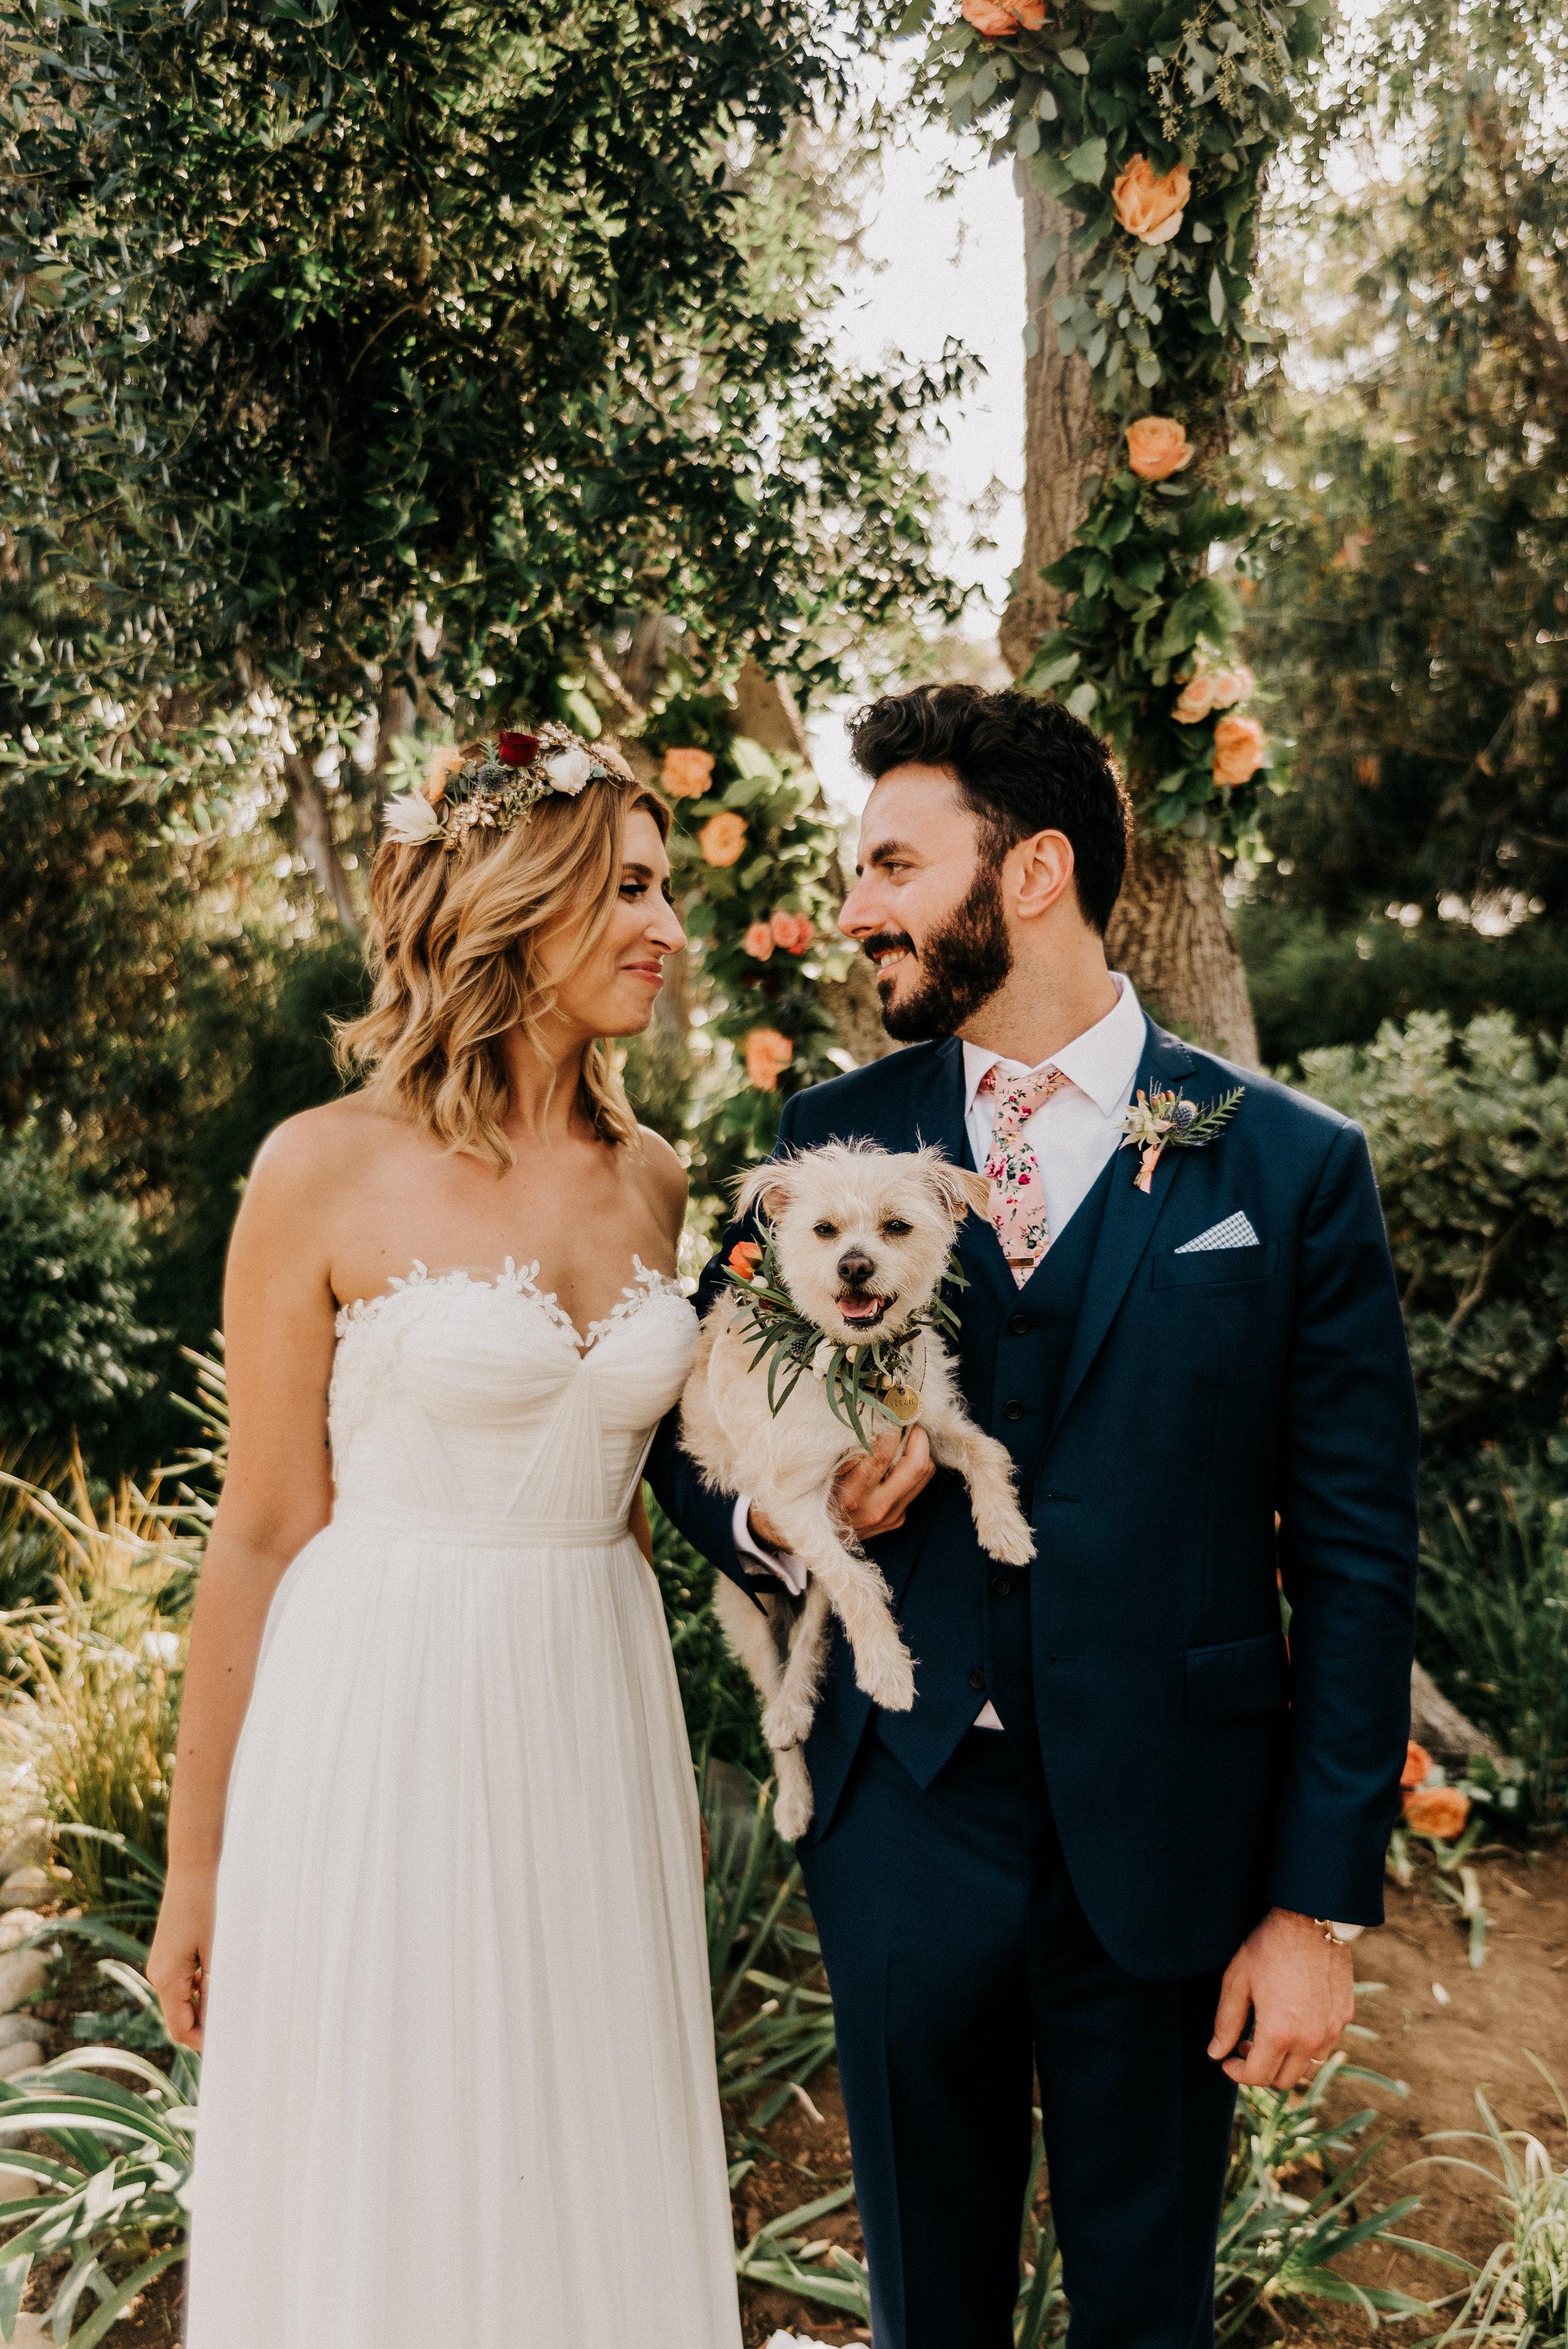 KATY PAUL WEDDING 2018-0058.jpg